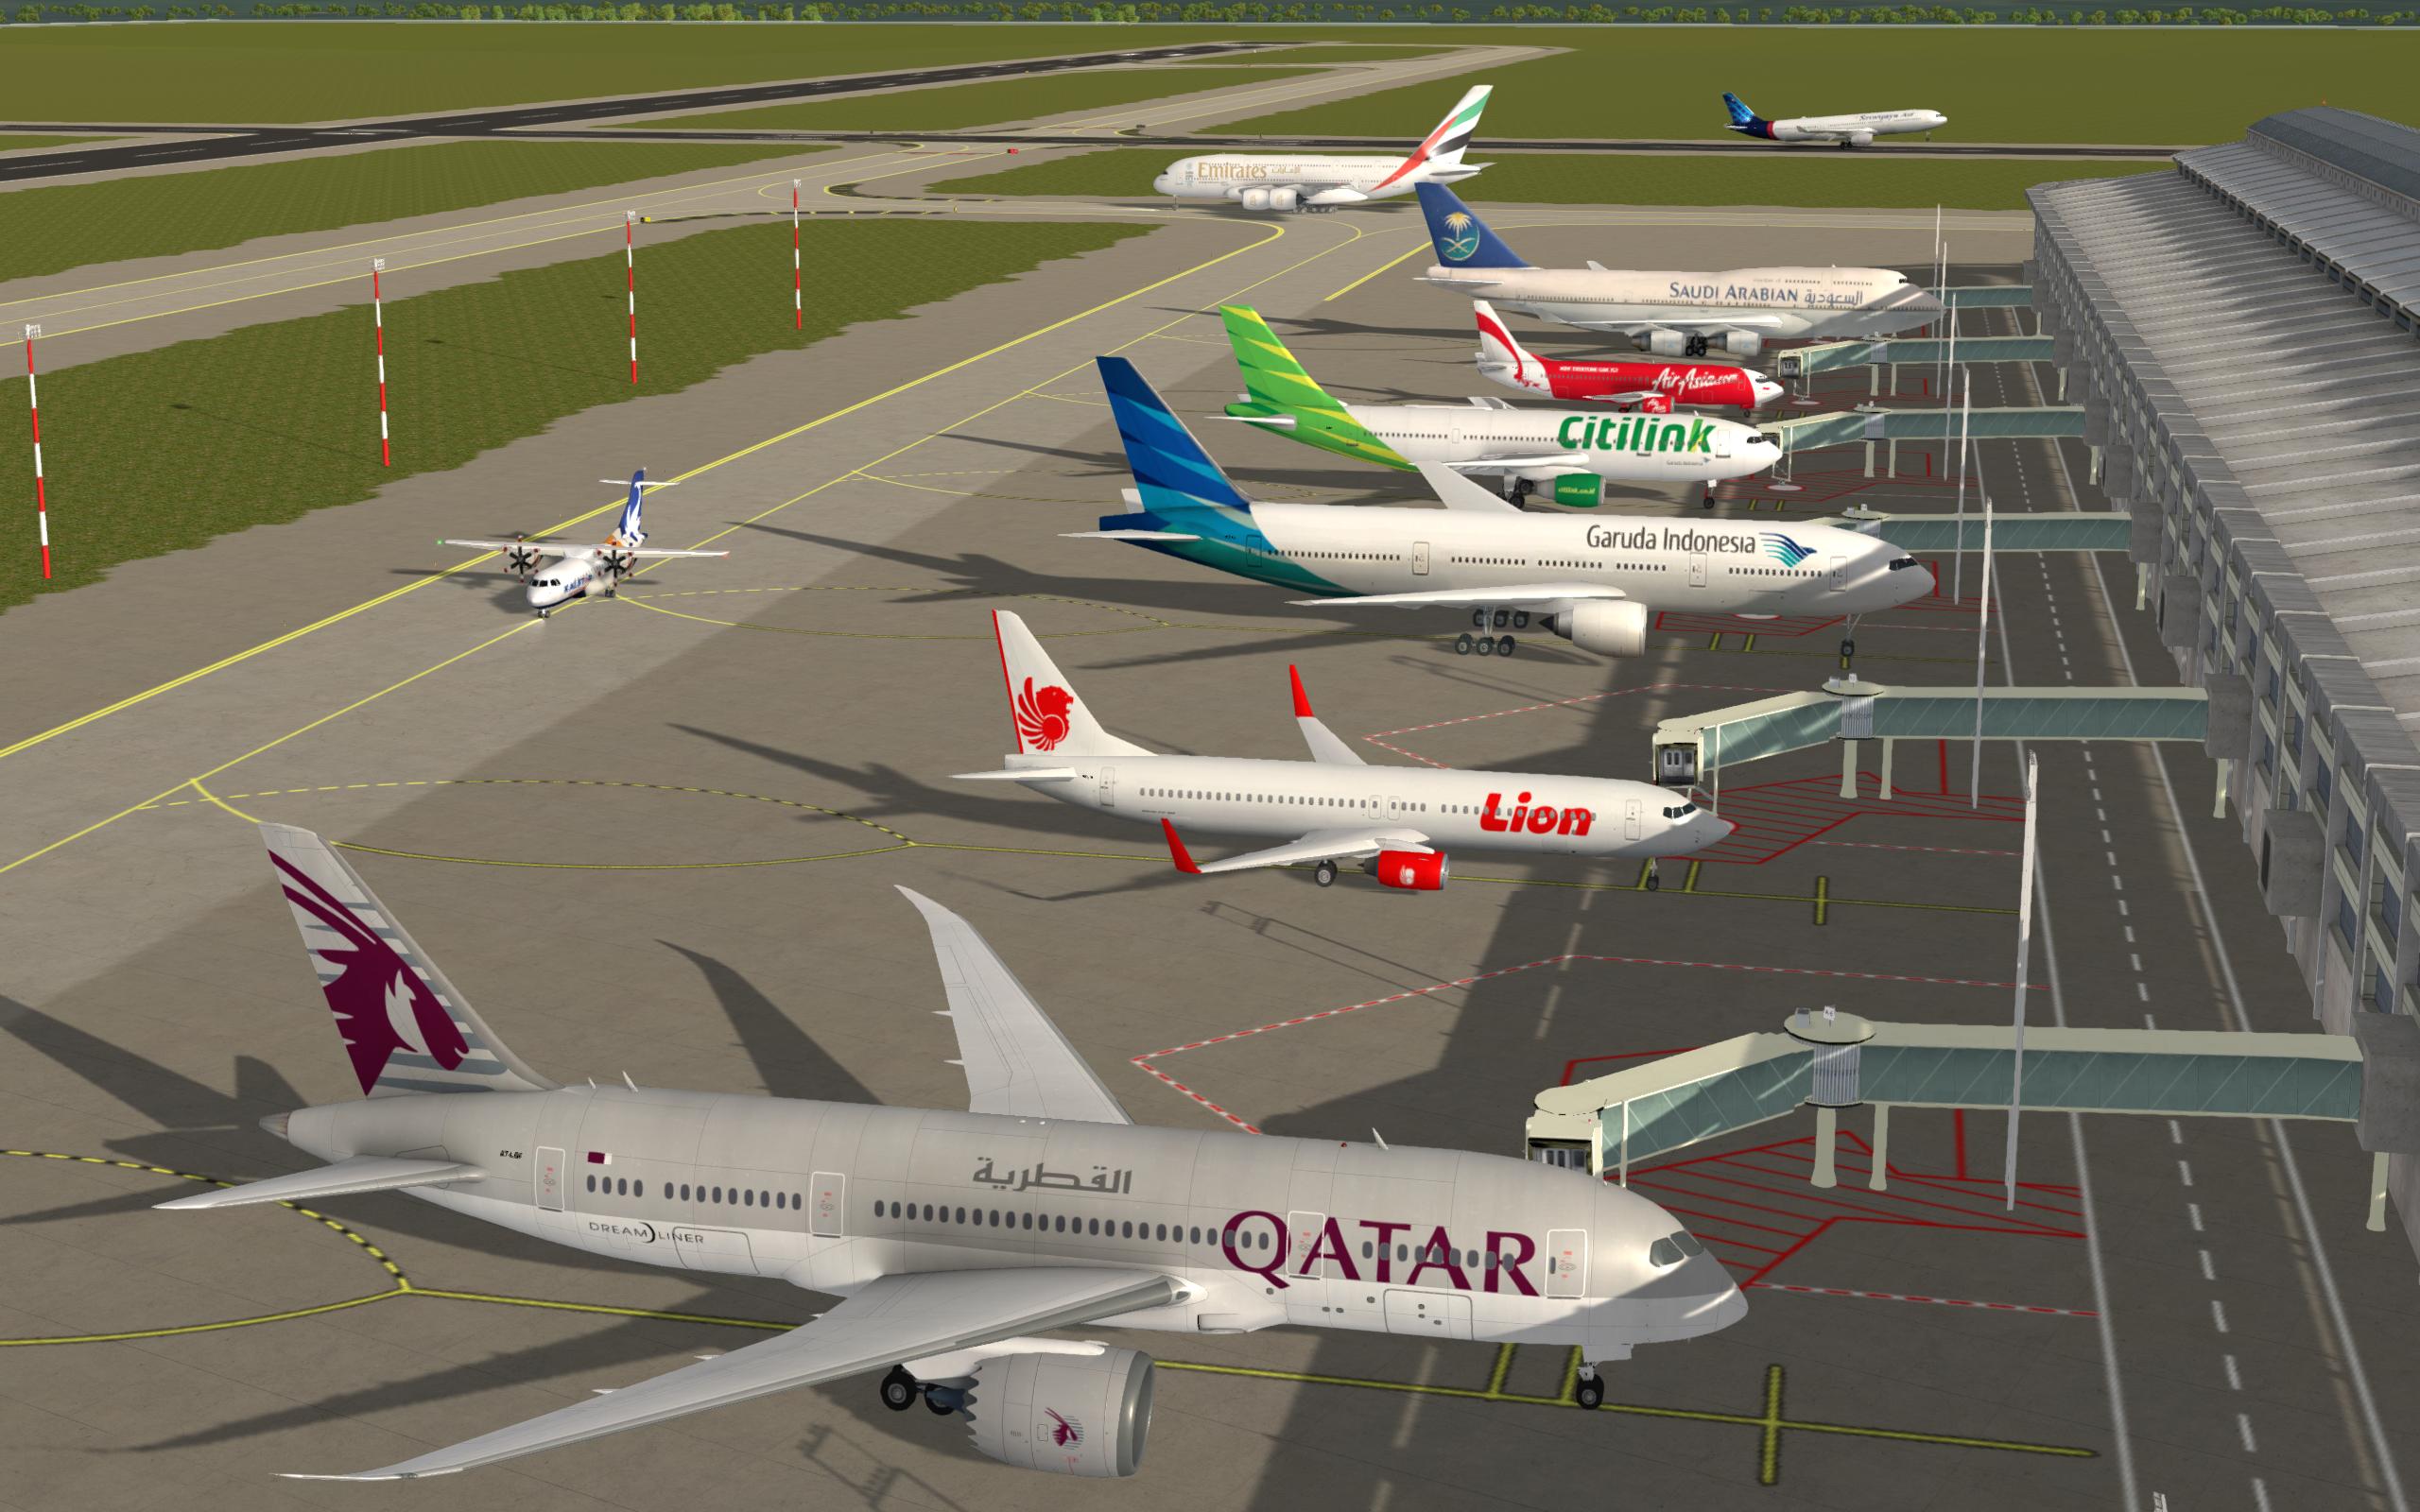 airport-simulation-small